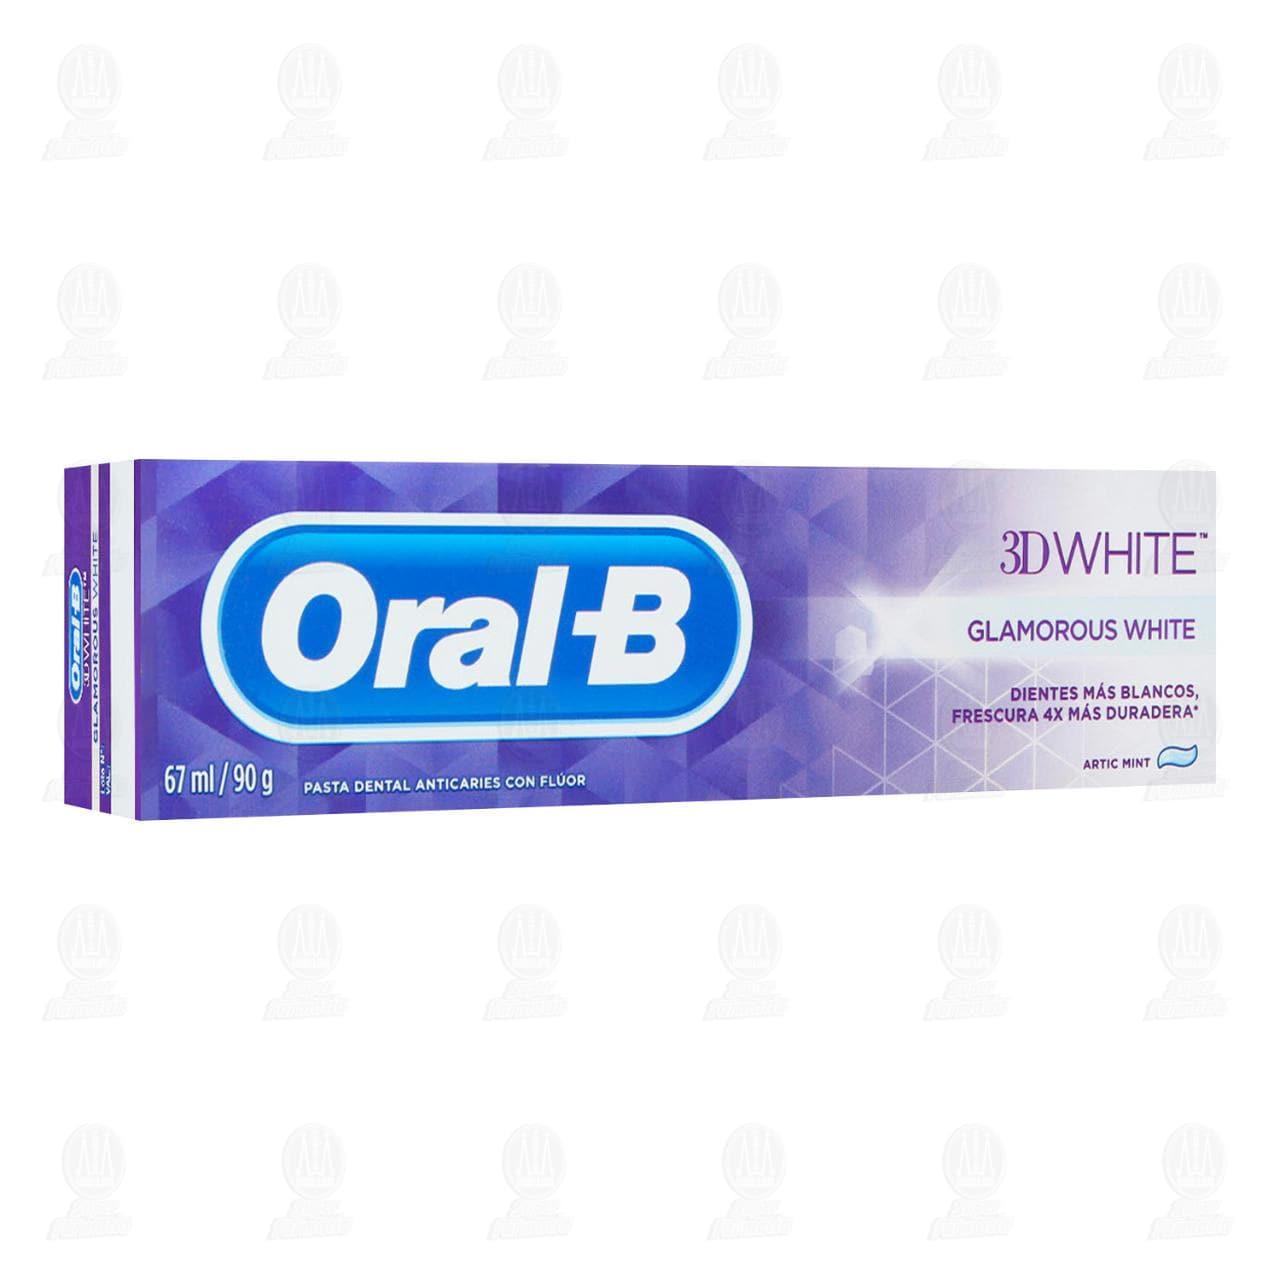 Comprar Pasta Dental Oral-B 3D-White Glamorous White, 67 ml. en Farmacias Guadalajara